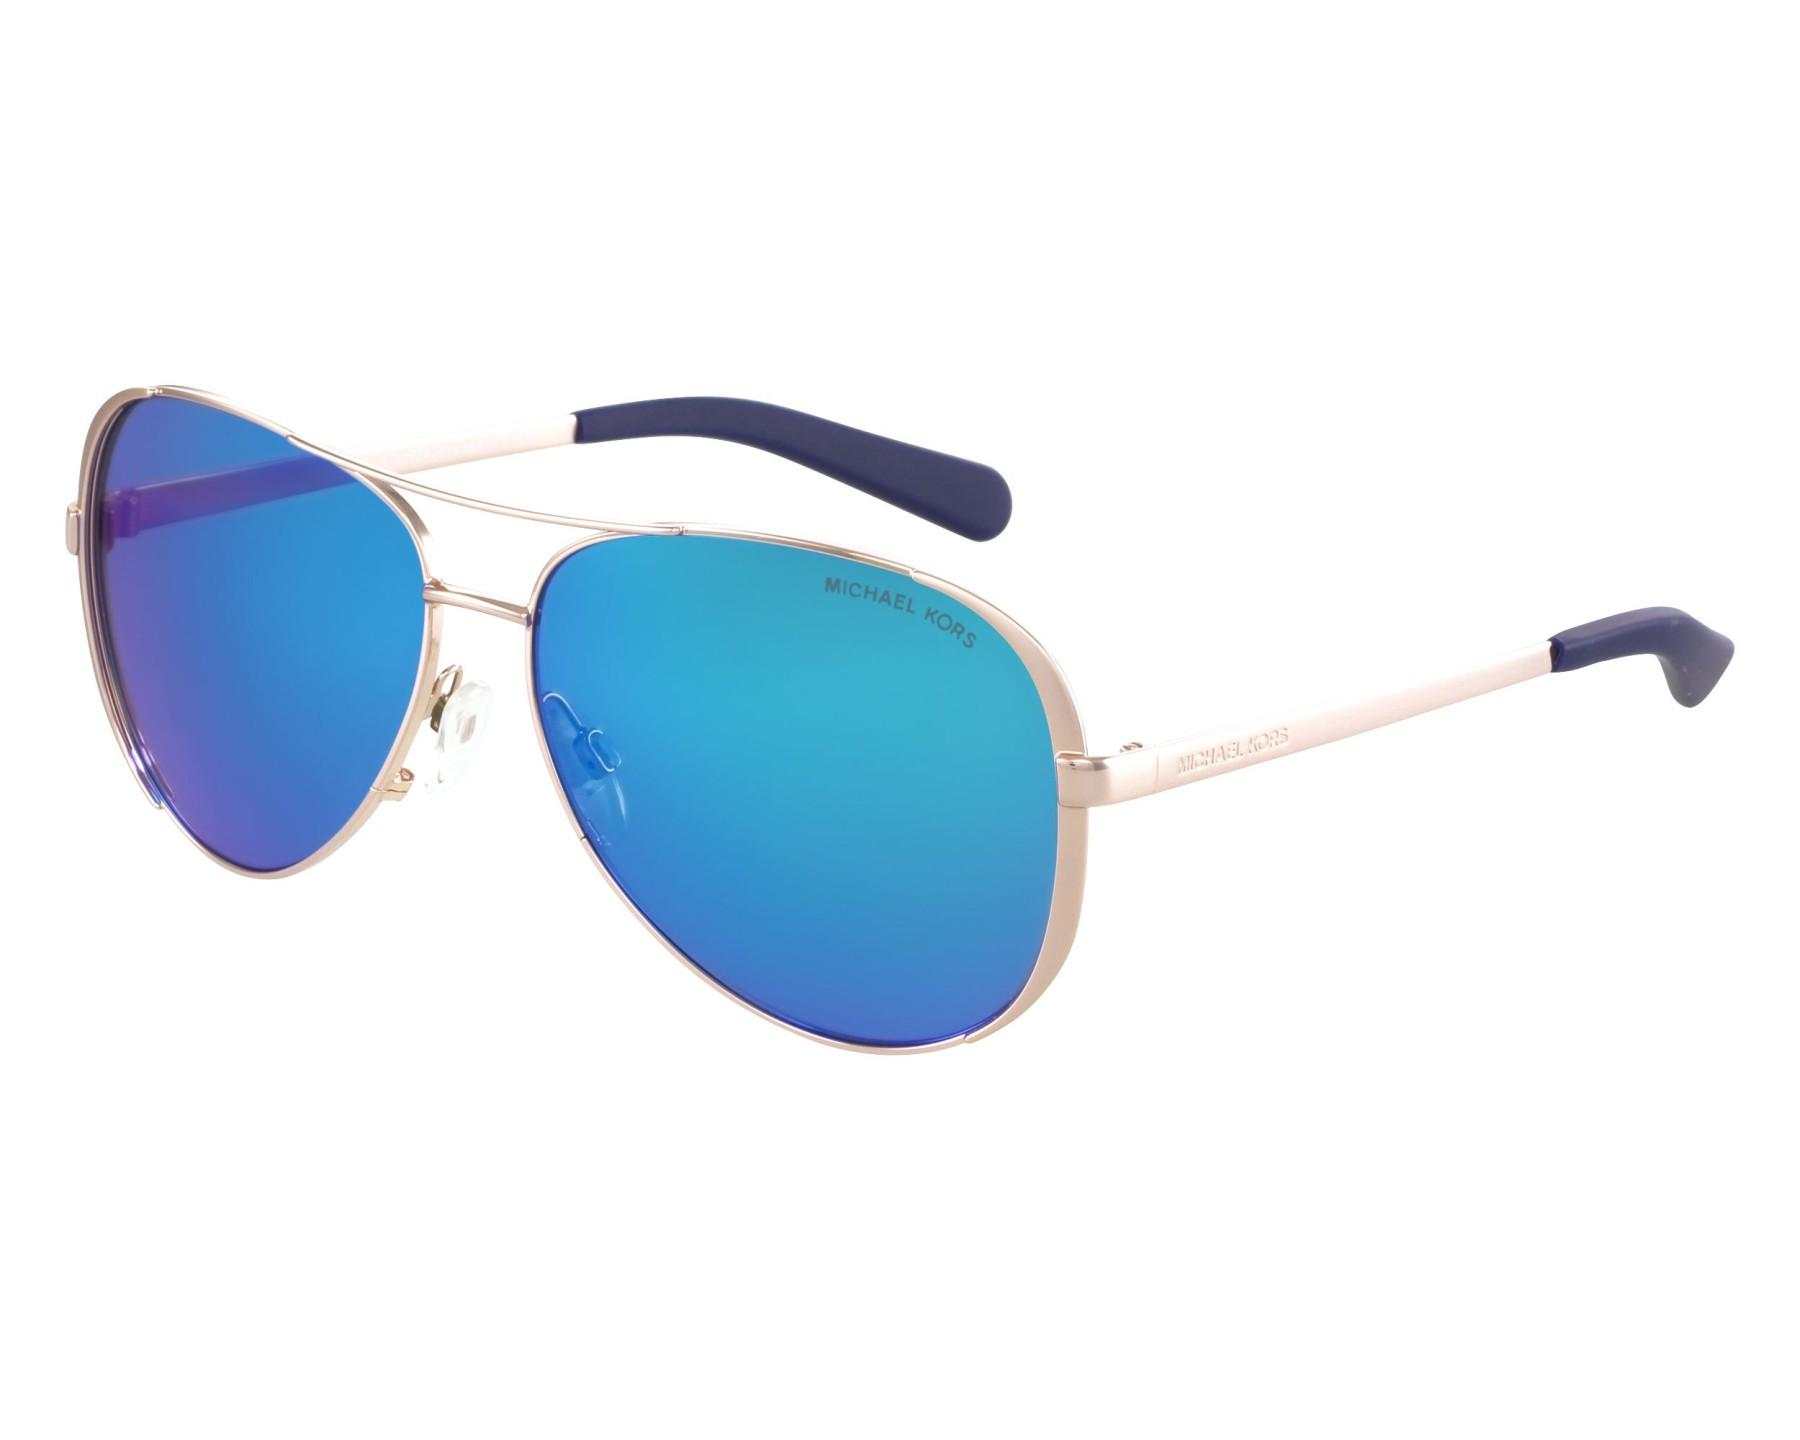 24e8af8f81b Sunglasses Michael Kors MK-5004 100325 - Gold front view